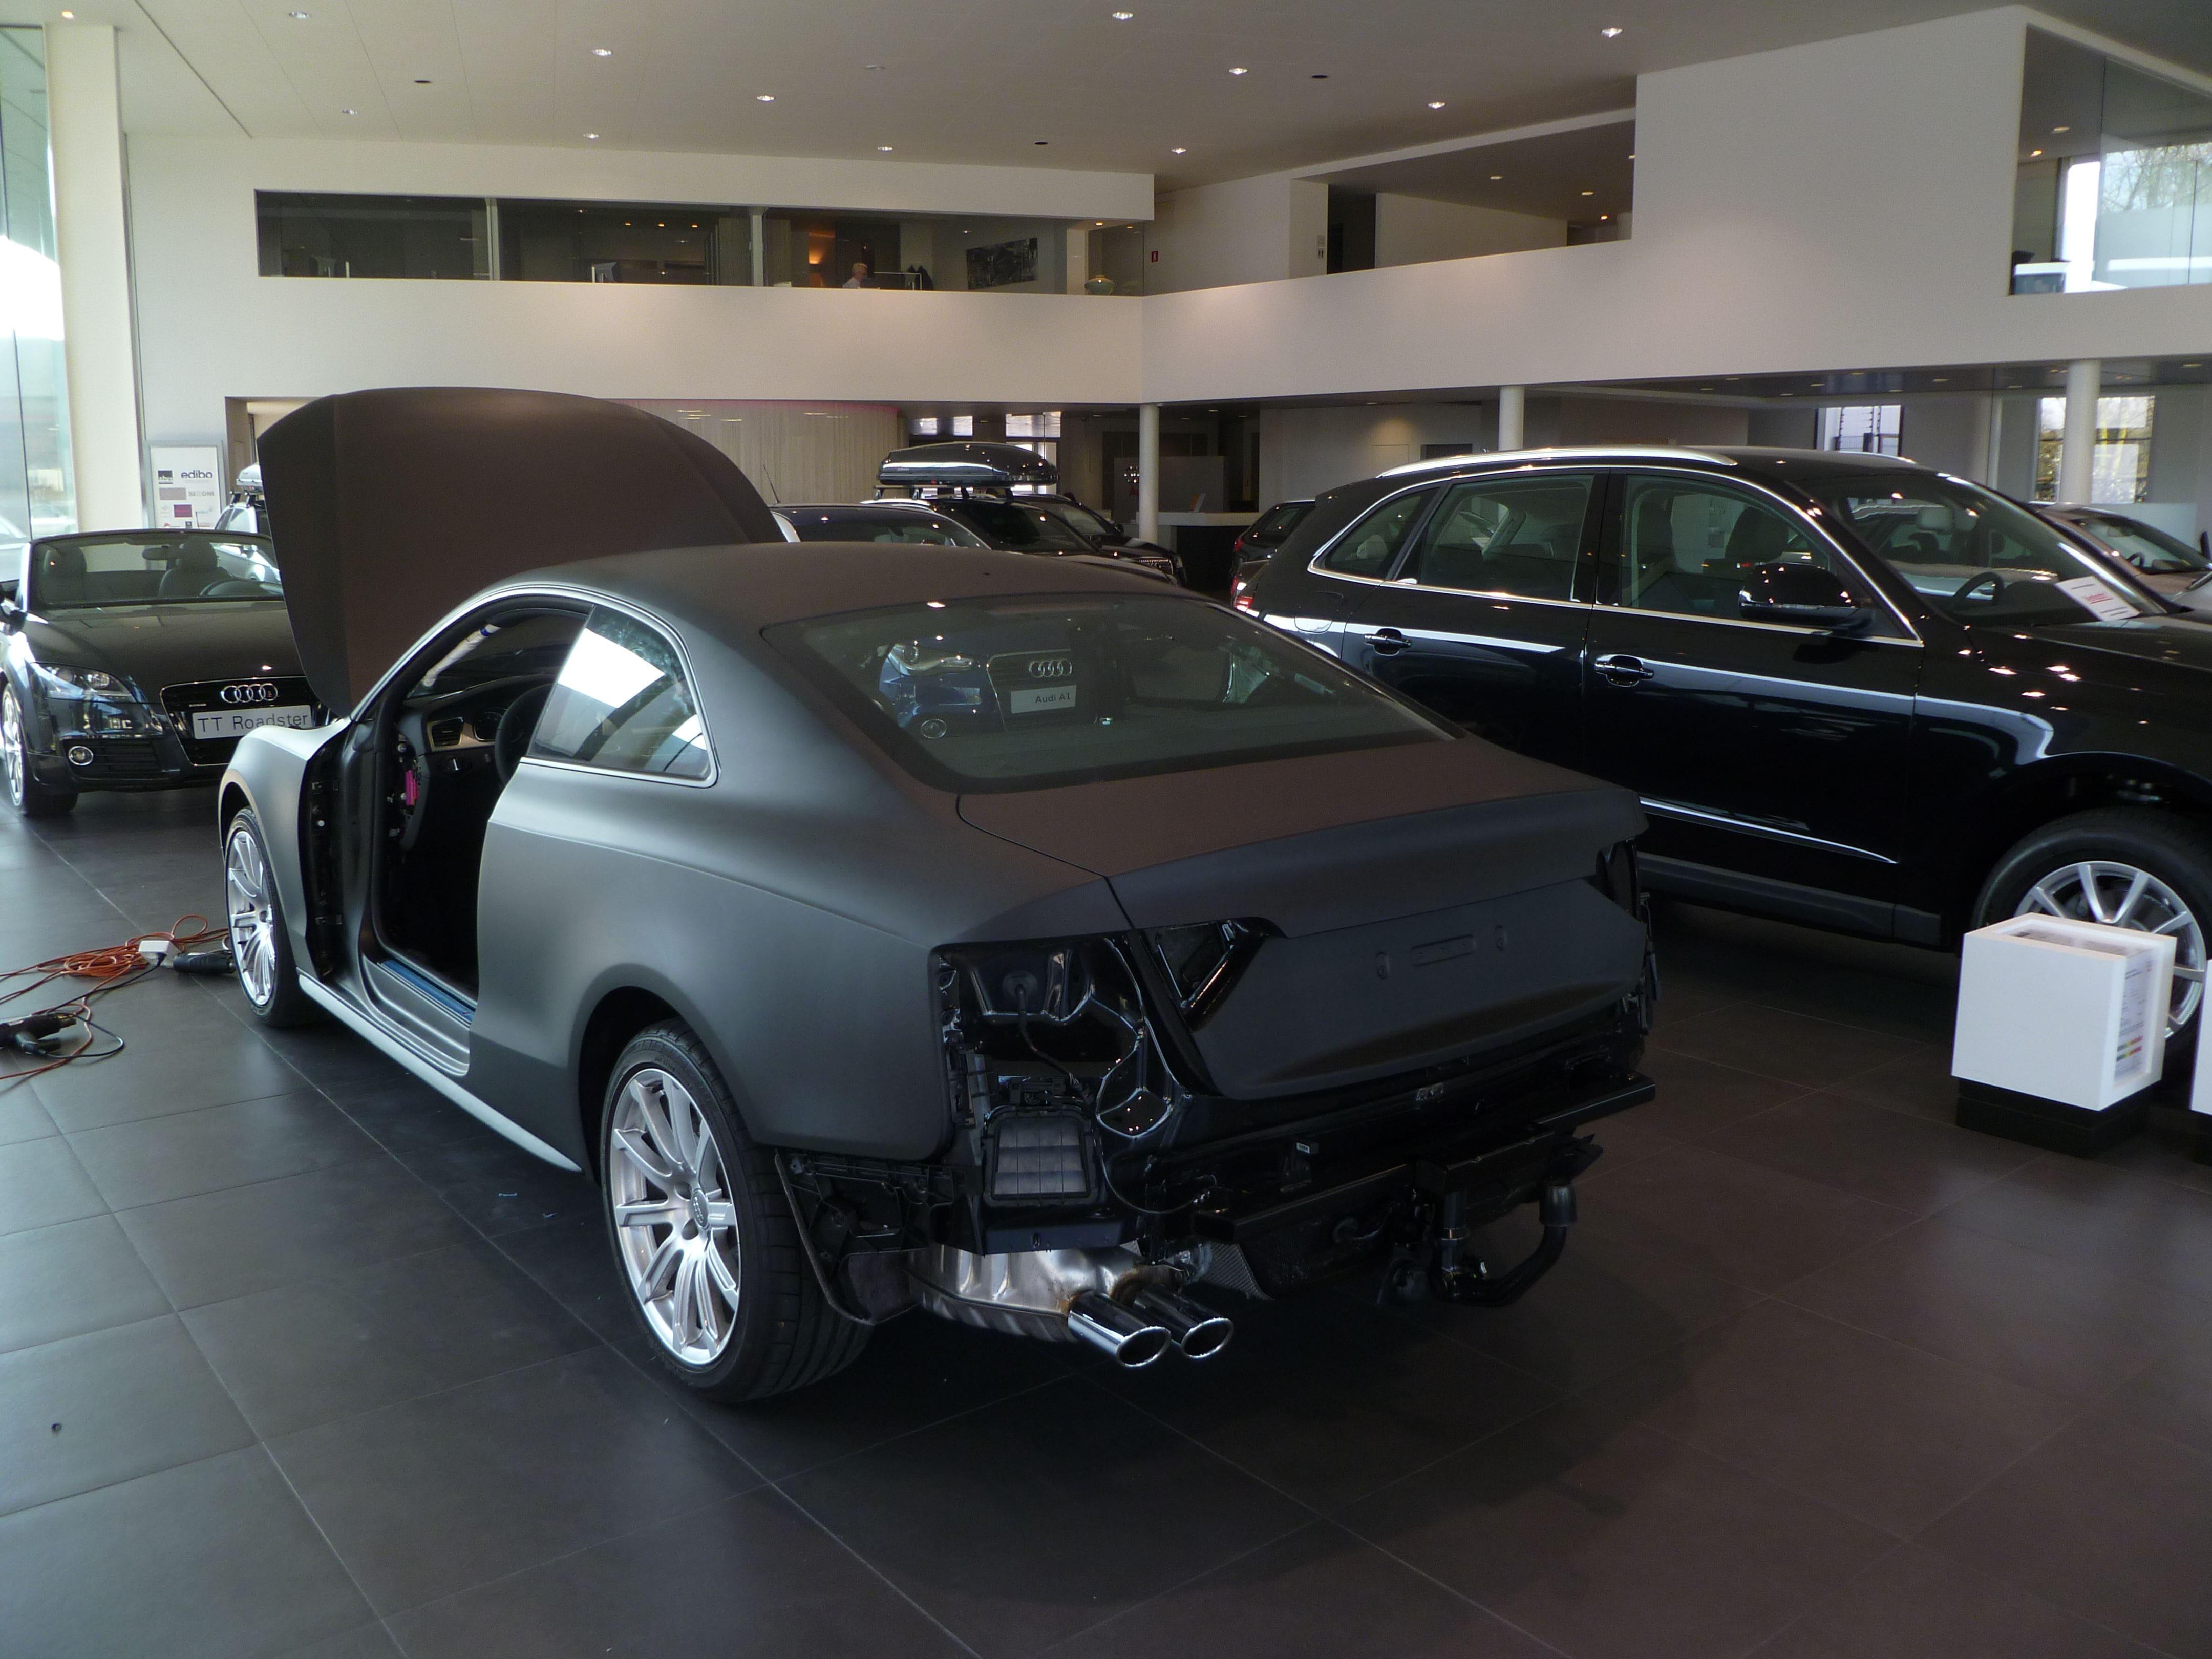 Audi A5 Coupe met Mat Zwarte Wrap, Carwrapping door Wrapmyride.nu Foto-nr:4646, ©2021